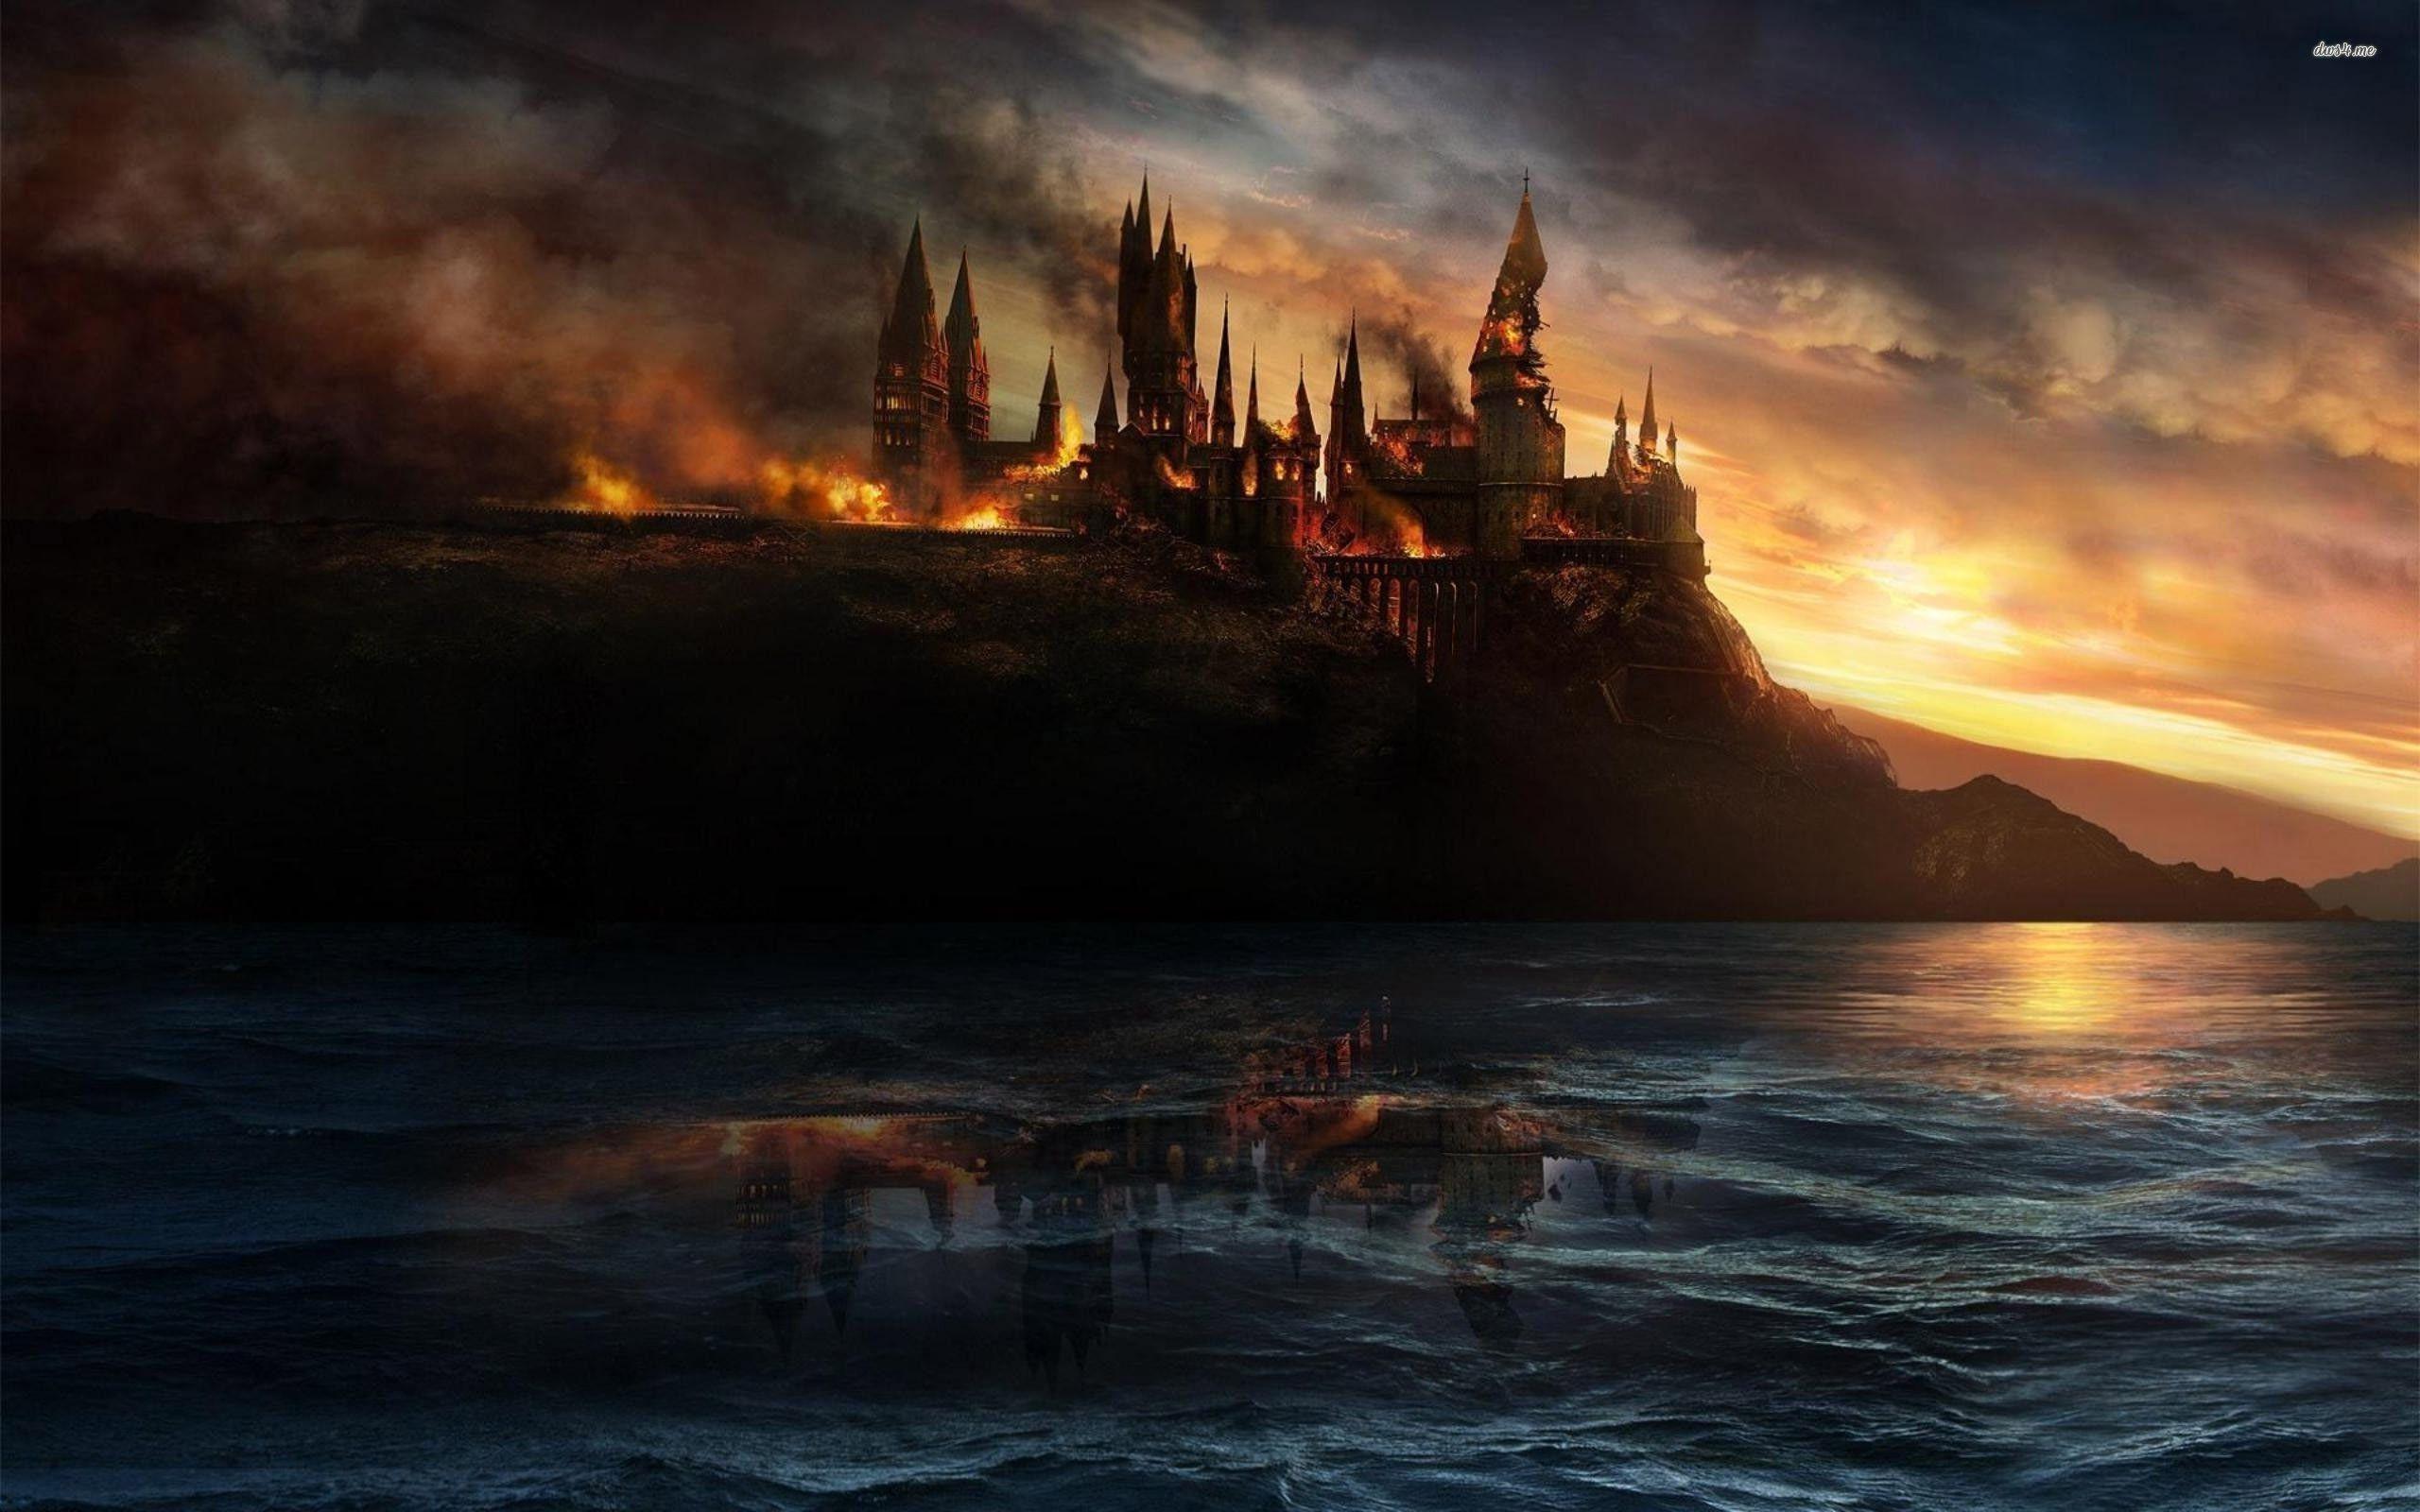 Harry Potter Wallpapers Hd: Harry Potter Wallpaper For Desktop (72+ Images